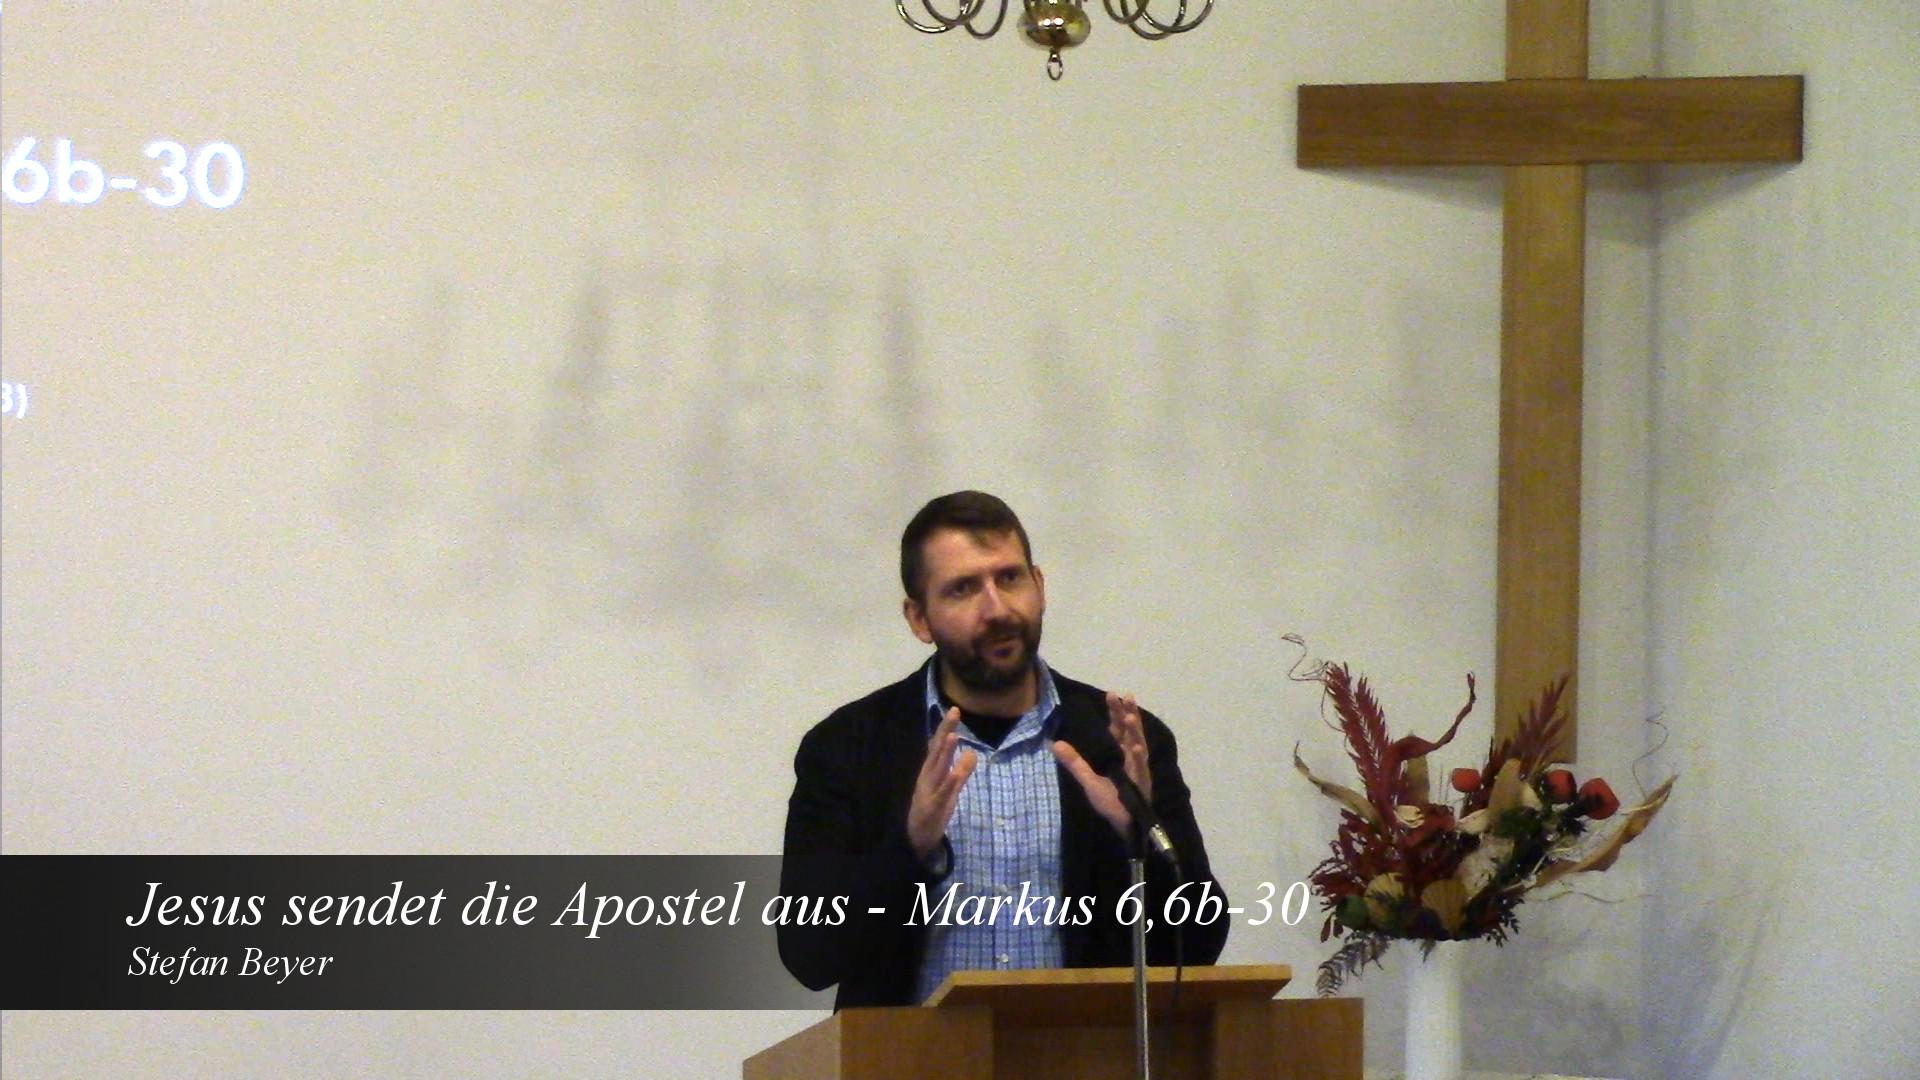 Jesus sendet die Apostel aus